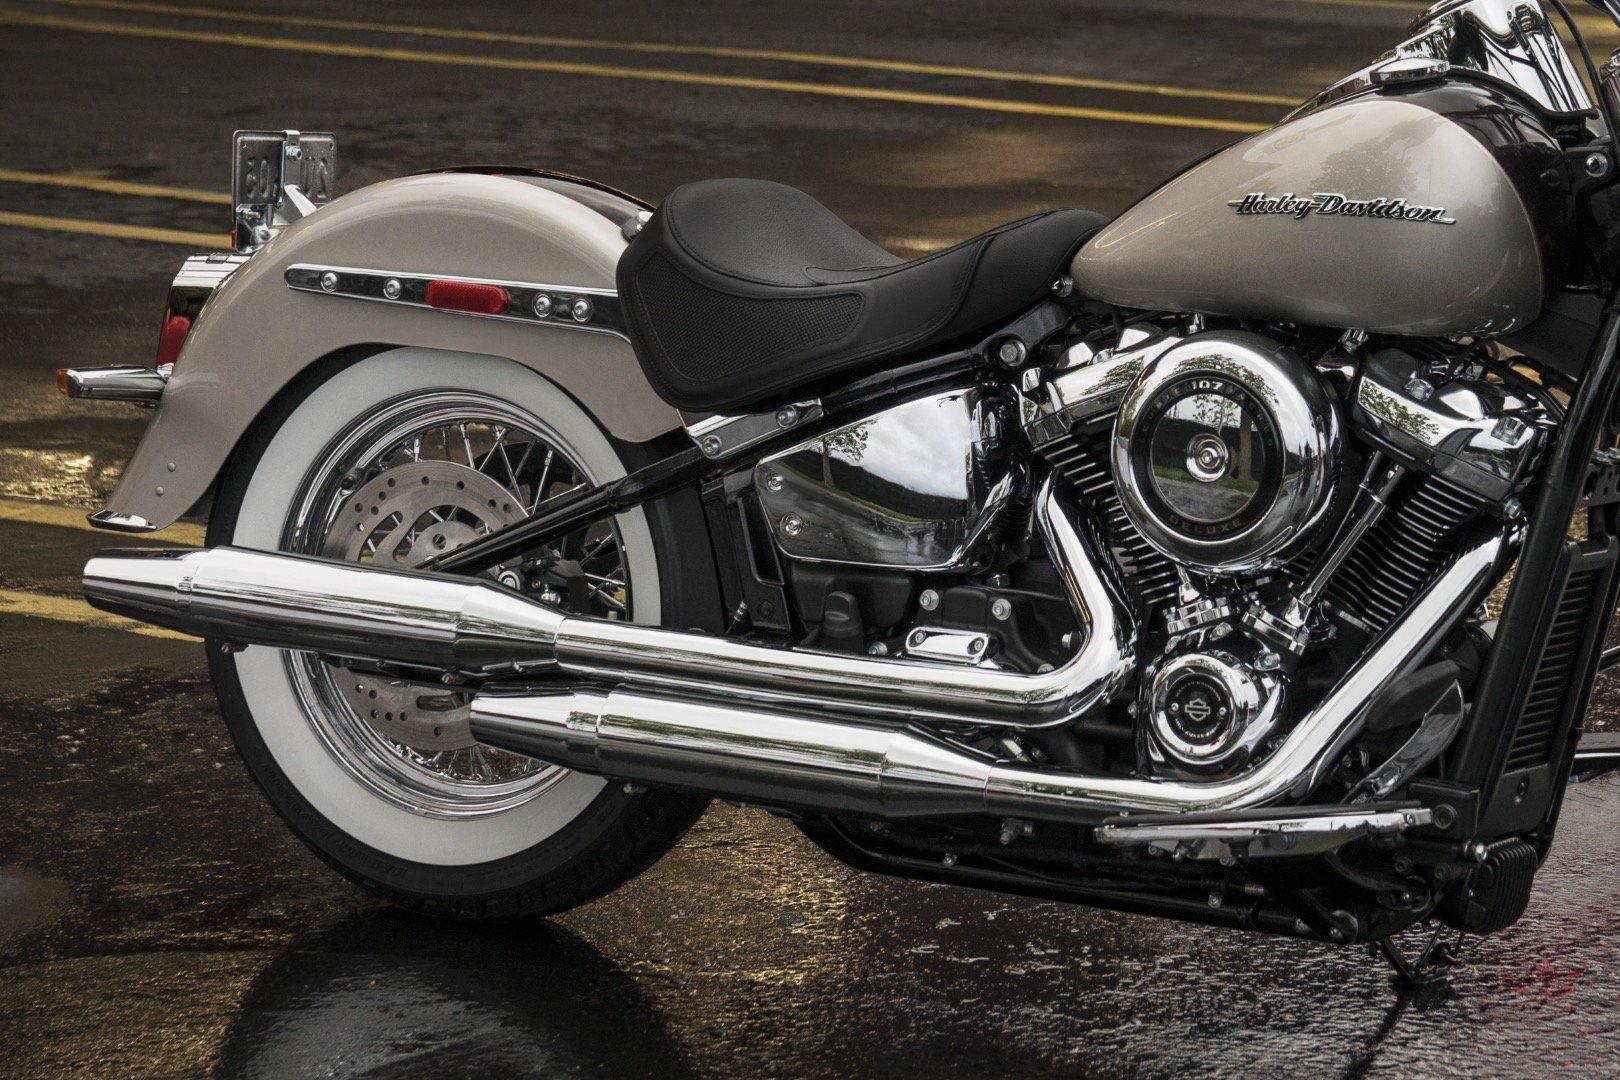 2018 Harley-Davidson Deluxe Buyer's Guide